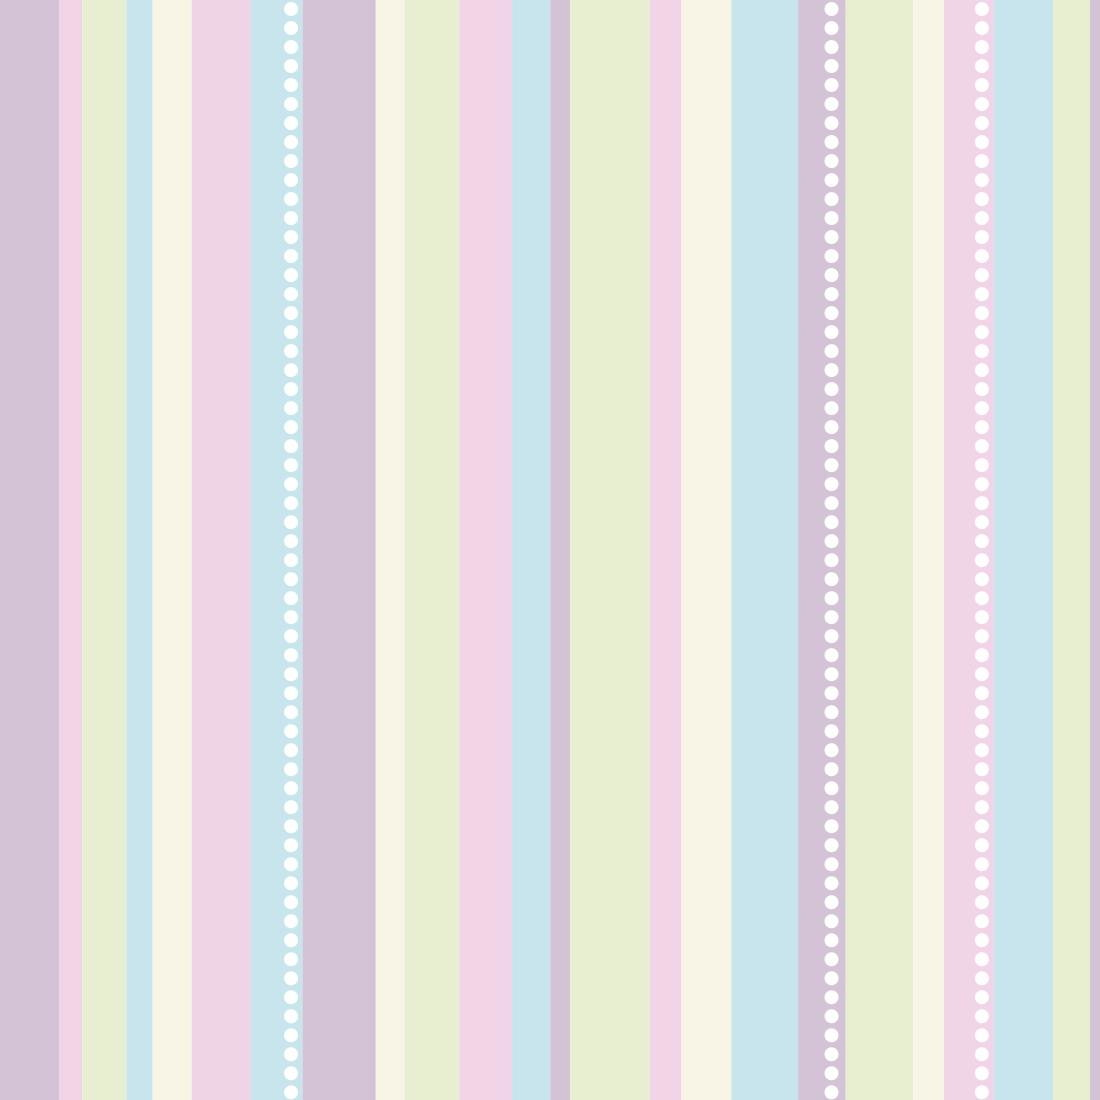 Papel de parede listras coloridas no elo7 crie decore 67d71c - Papel vinilico para paredes ...